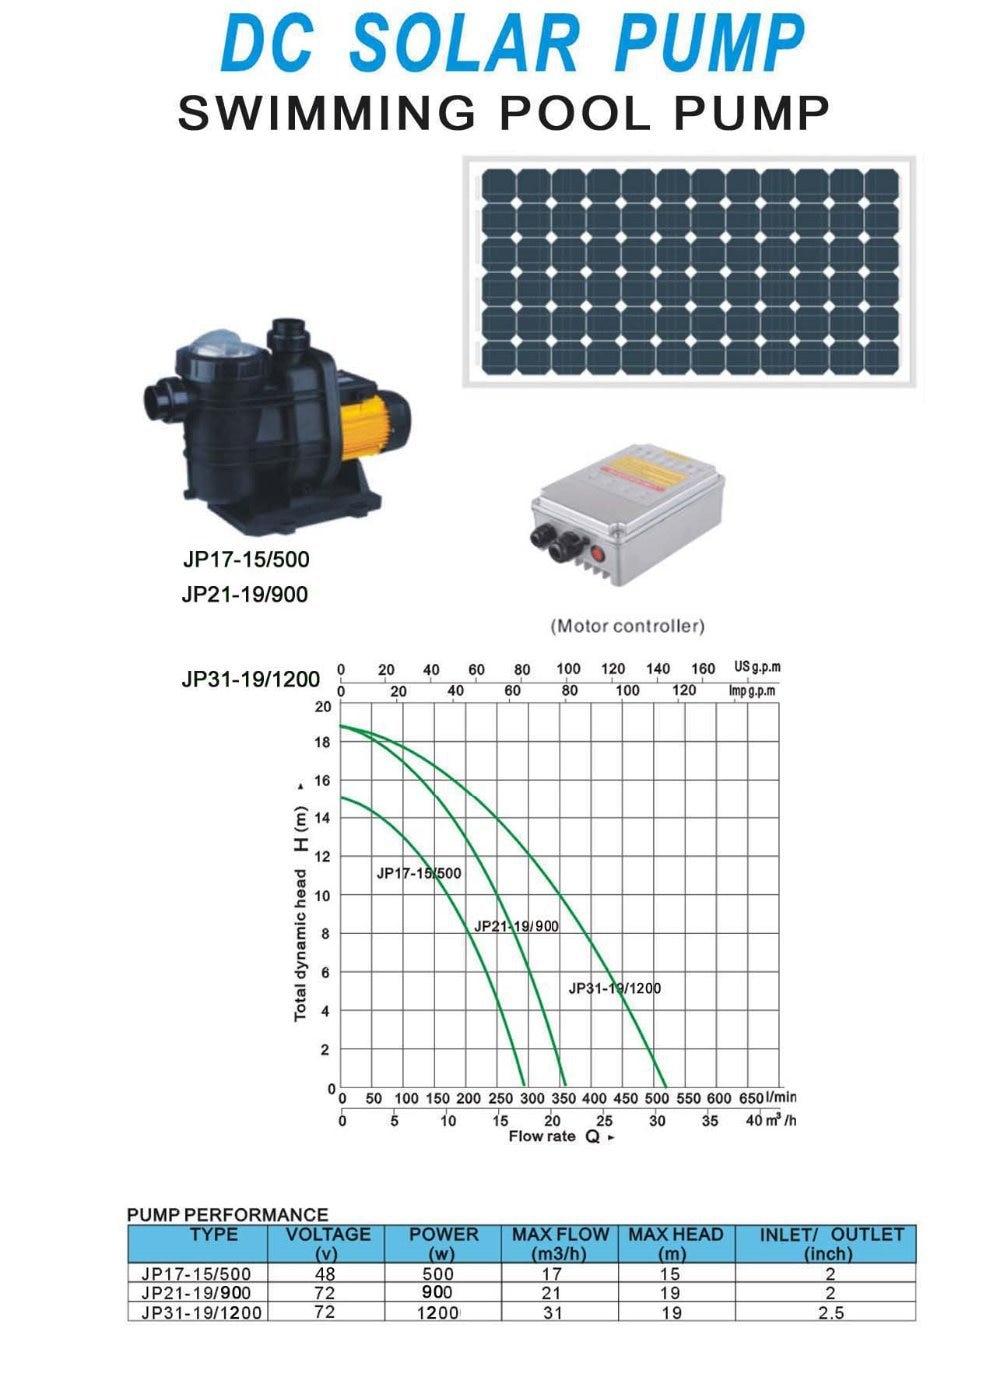 370w Solar DC Swimming Pool Pump,solar powered swimming pool pumps,free shipping,3 years warranty,Model JP13-13/370